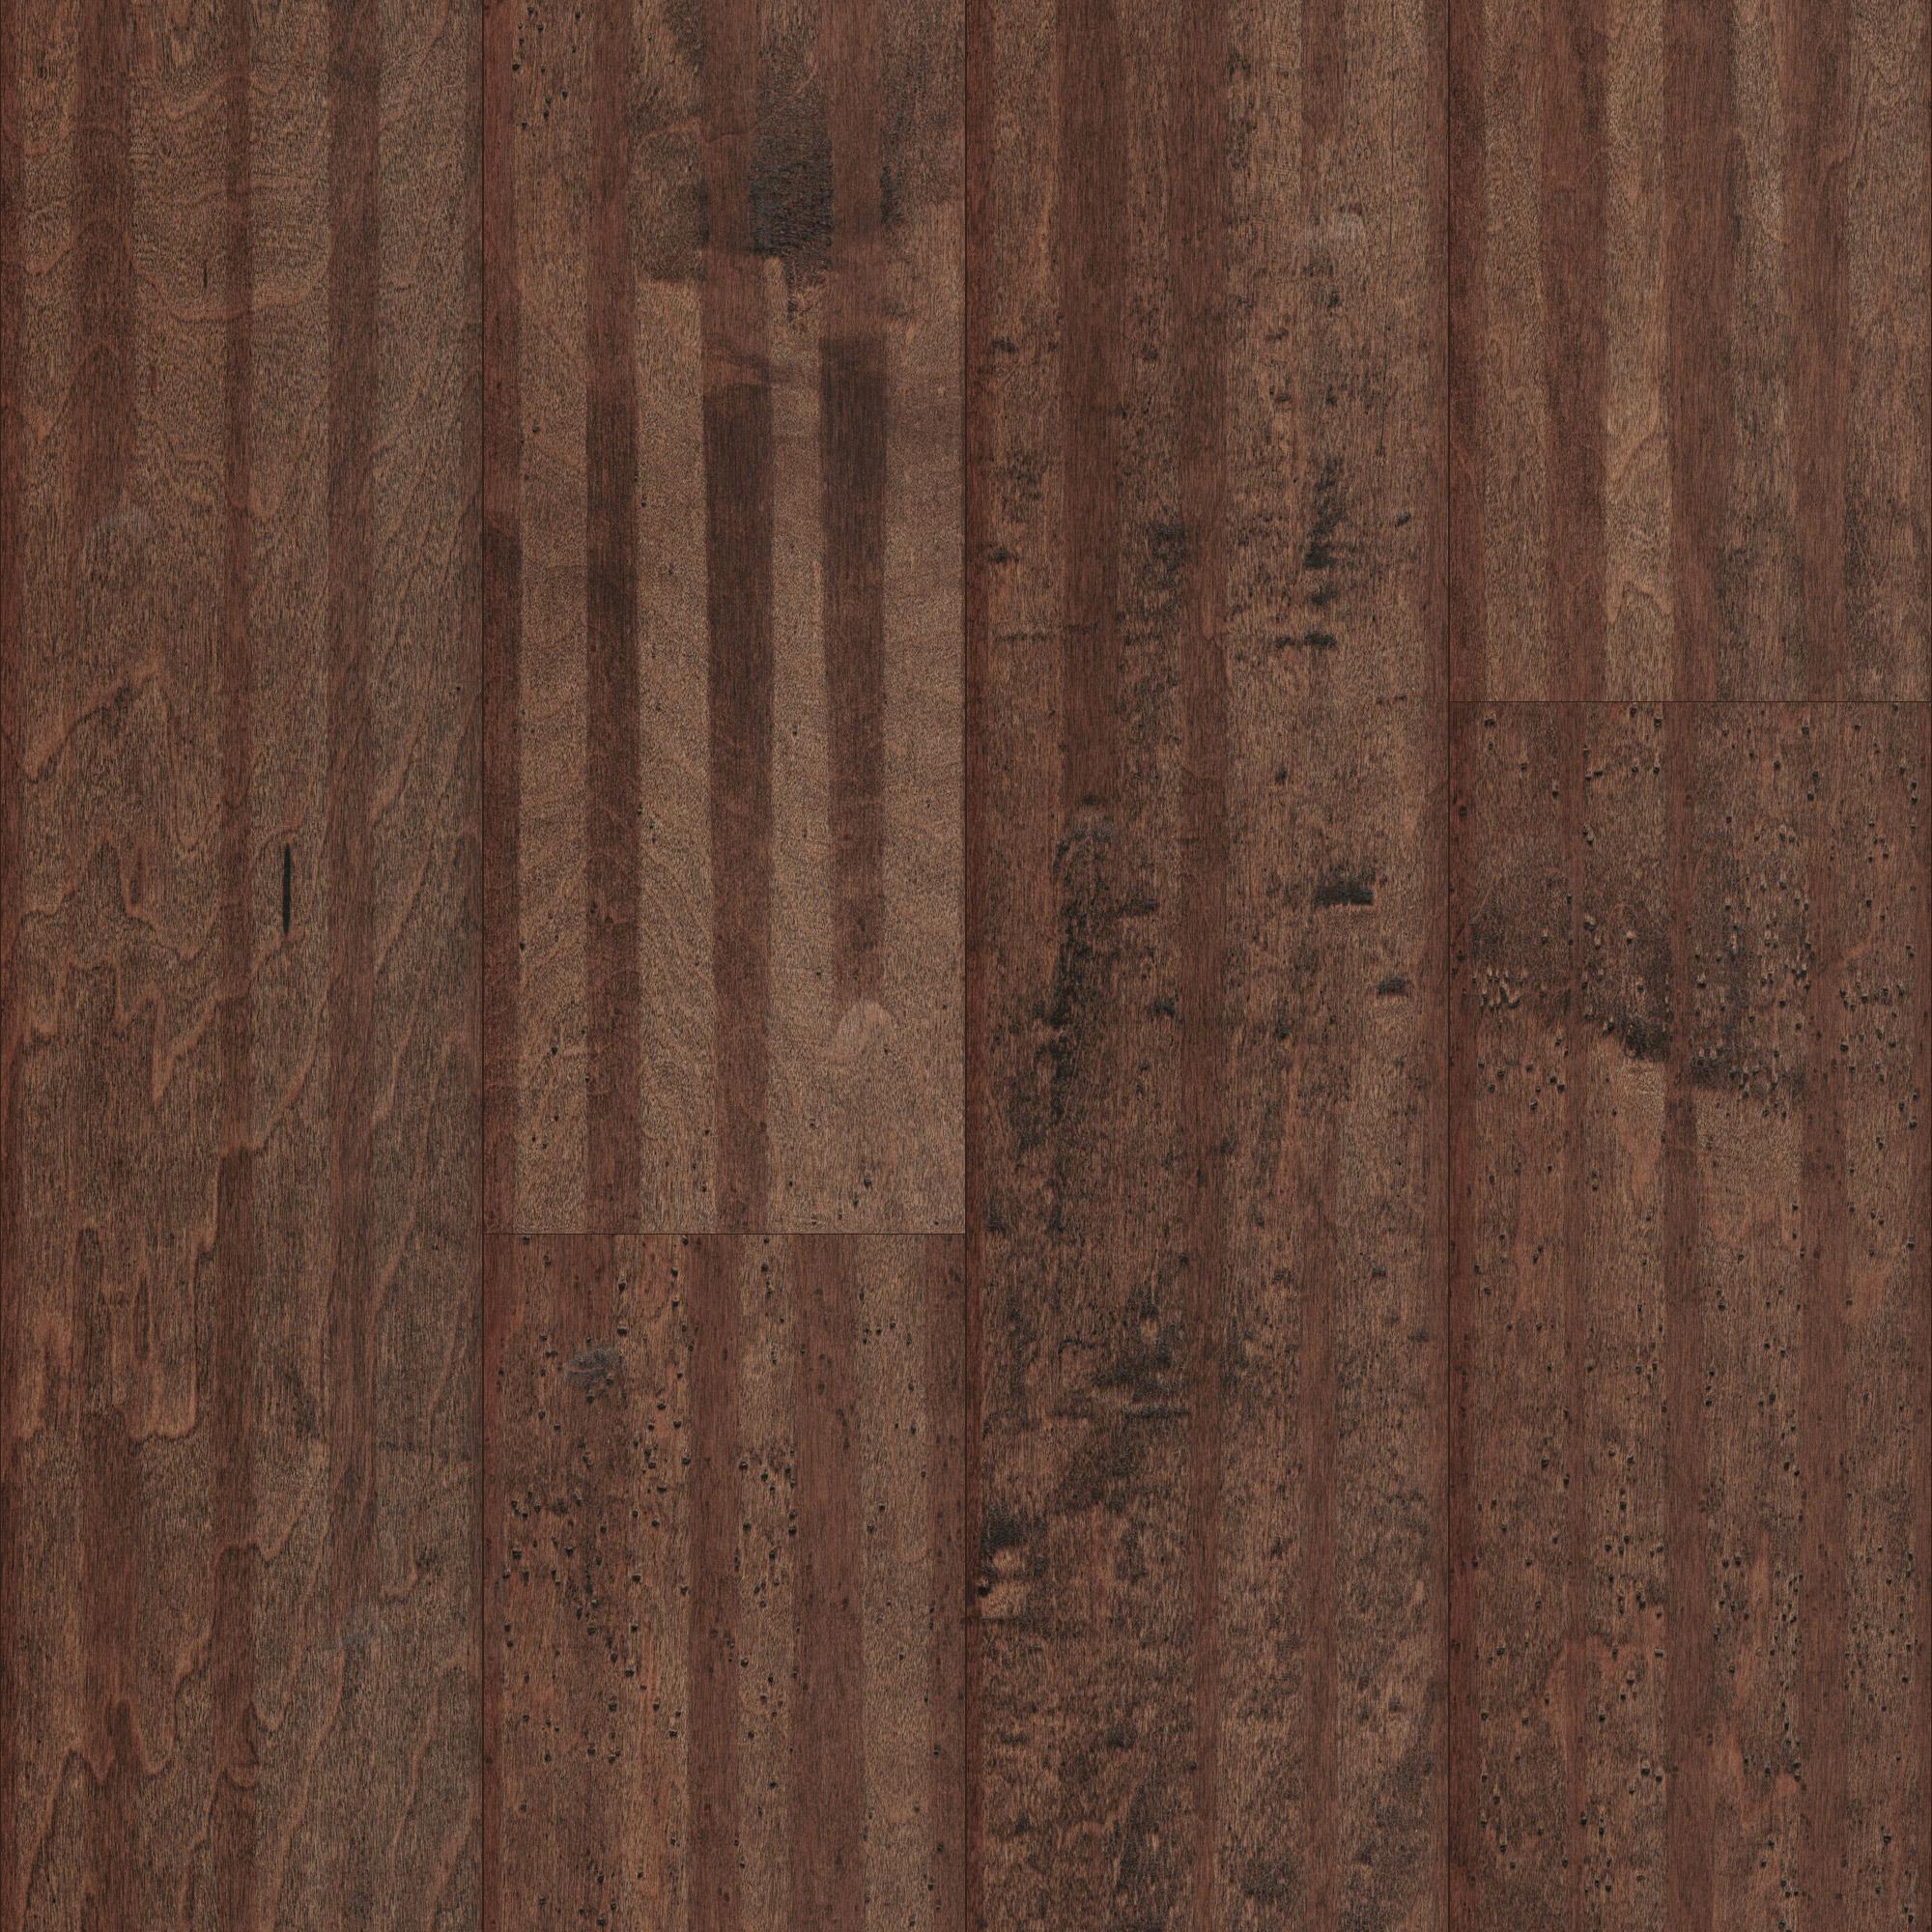 10 attractive Bruce Hardwood Floor Cleaner 2021 free download bruce hardwood floor cleaner of mullican lincolnshire sculpted maple autumn 5 engineered hardwood with mullican lincolnshire sculpted maple autumn 5 engineered hardwood flooring